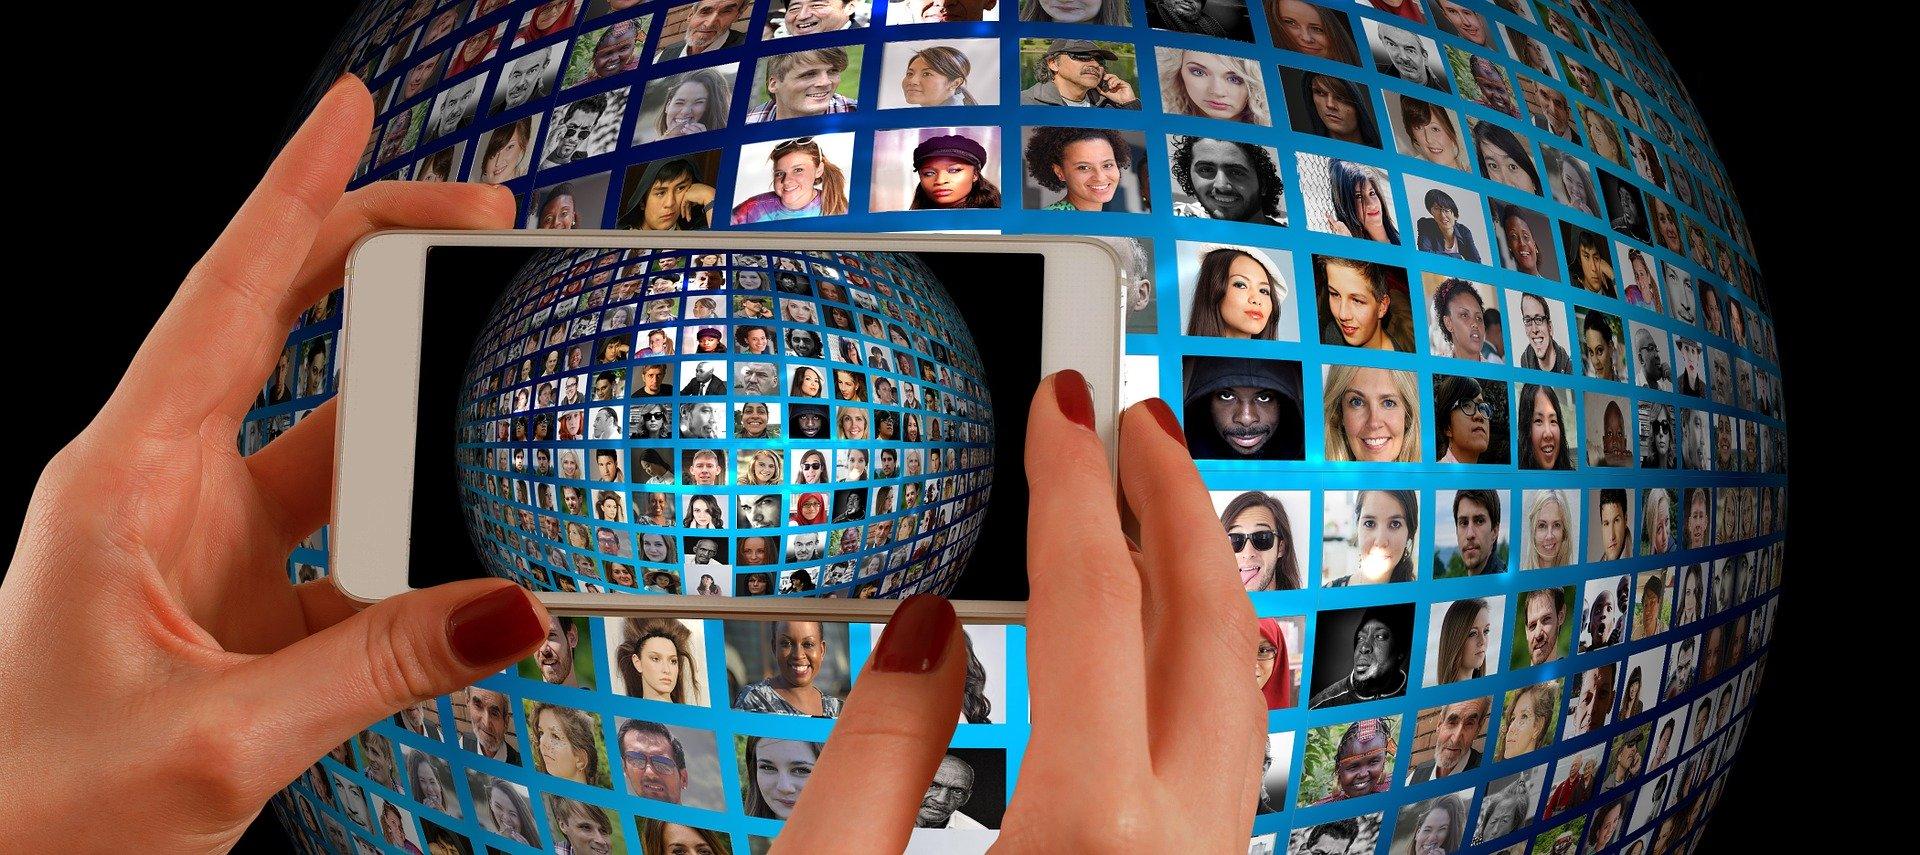 Faces across the globe through smartphone